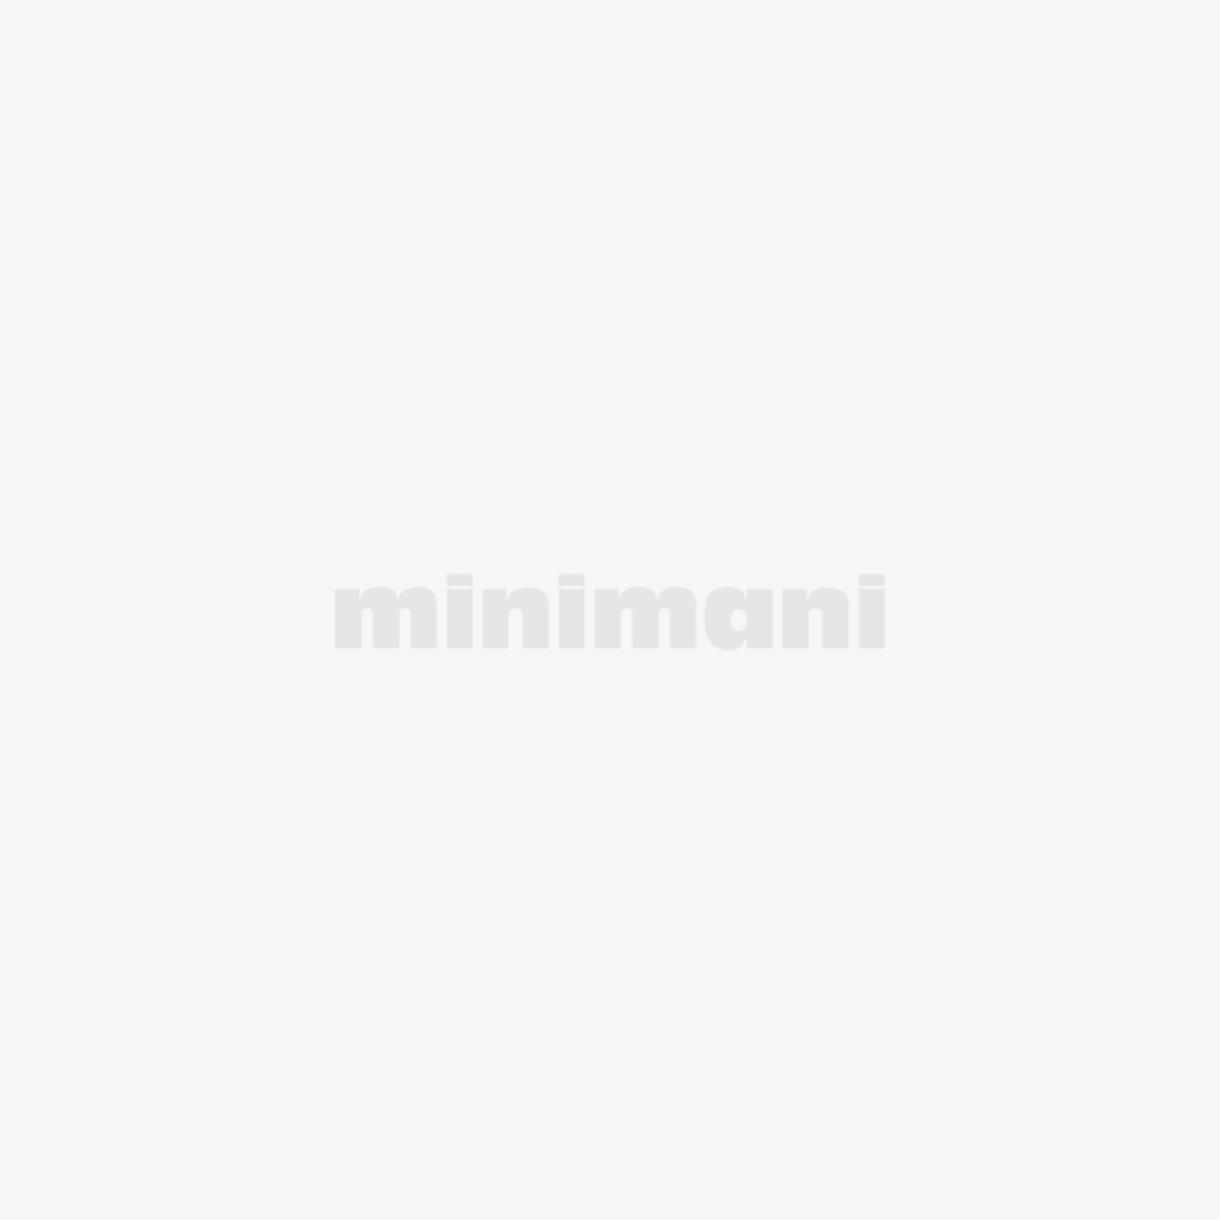 TALOUSMITTA DOMINO 1,0 L